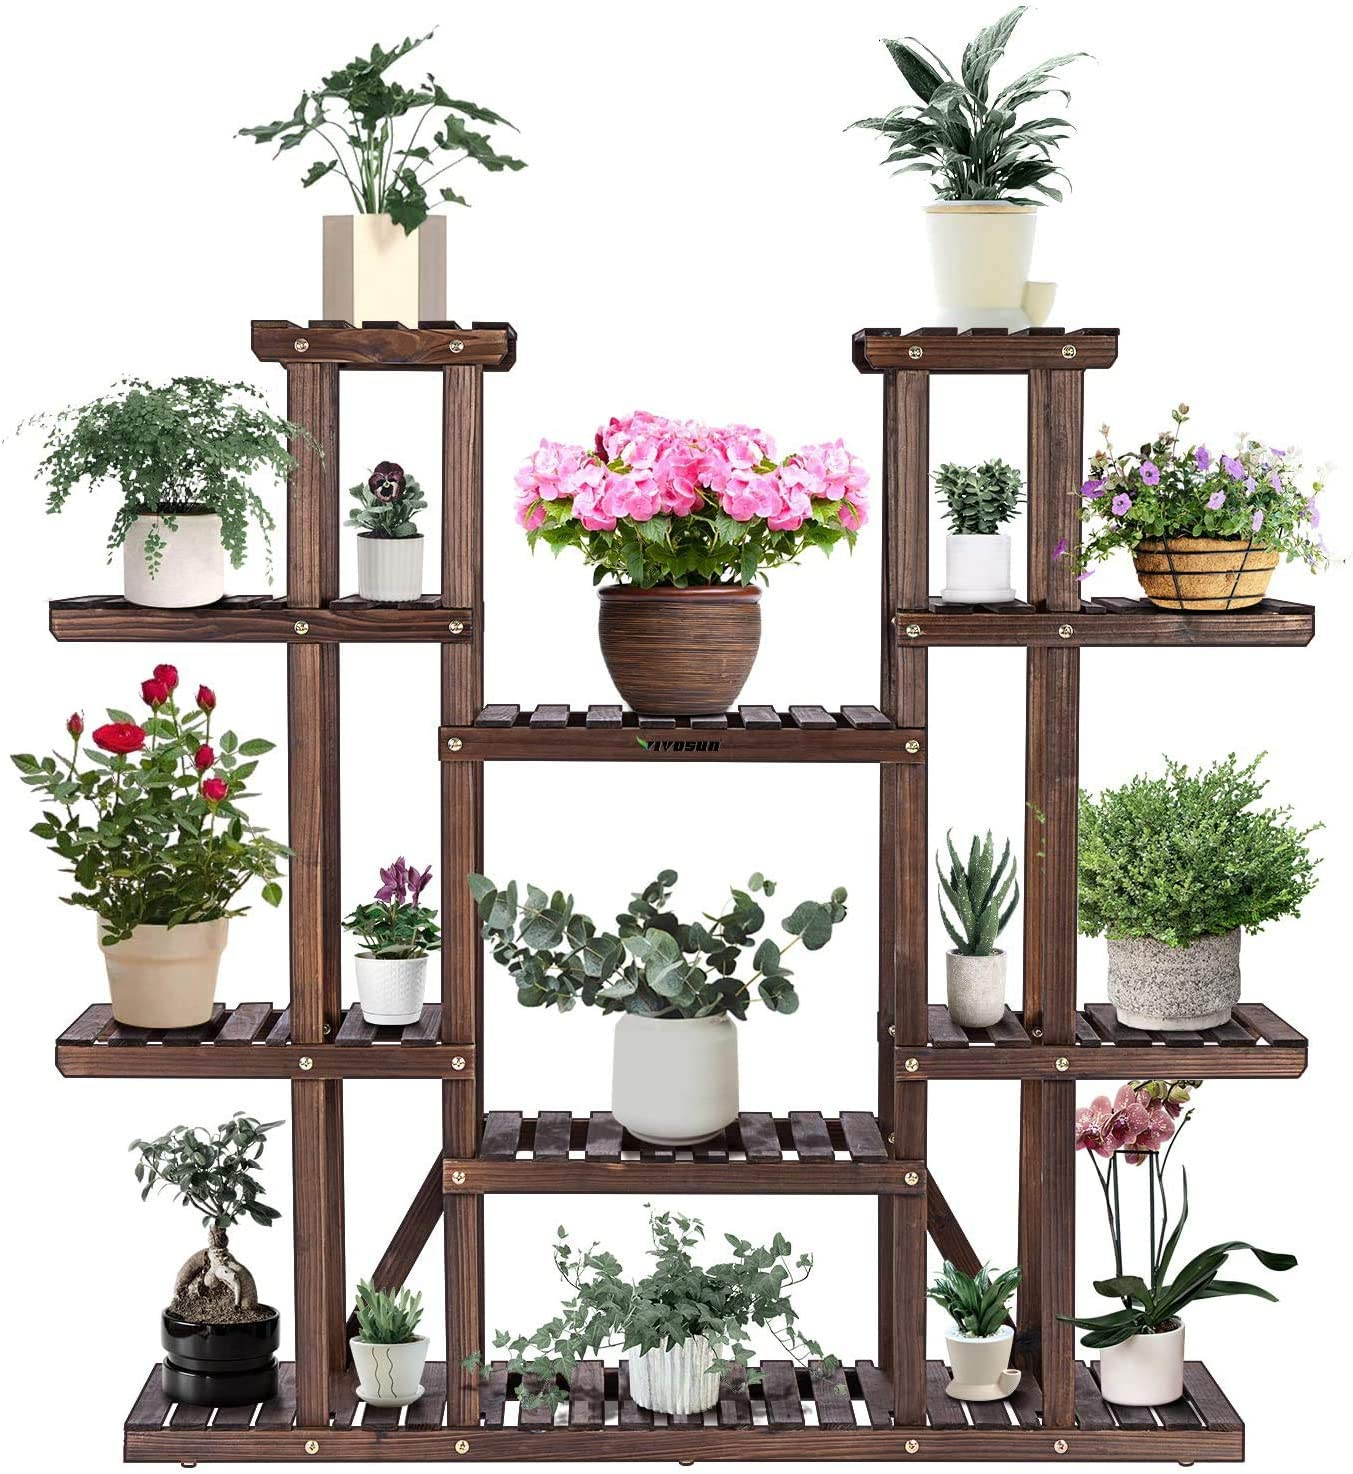 Amazon Com Vivosun 9 Tier Wooden Plant Stand Carbonized 17 Potted Flower Shelf Display Rack Holder 44 5 High Flower Stand For Patio Garden Balcony Indoor Outdoor Garden Outdoor